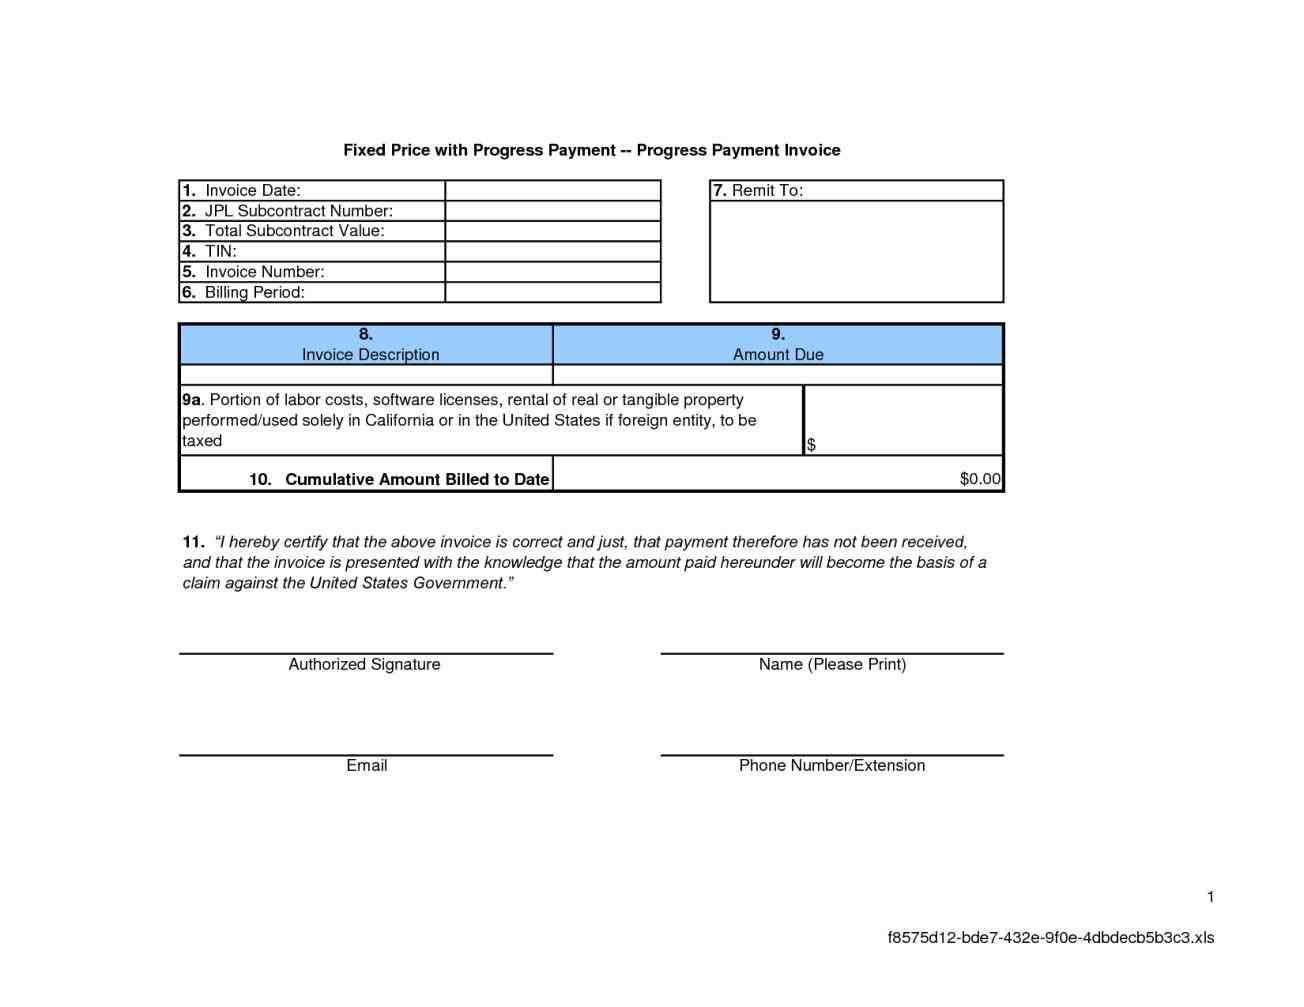 advance Advance Payment Invoice payment invoice sample template ideas advance Advance Payment Invoice payment invoice sample template ideas collect